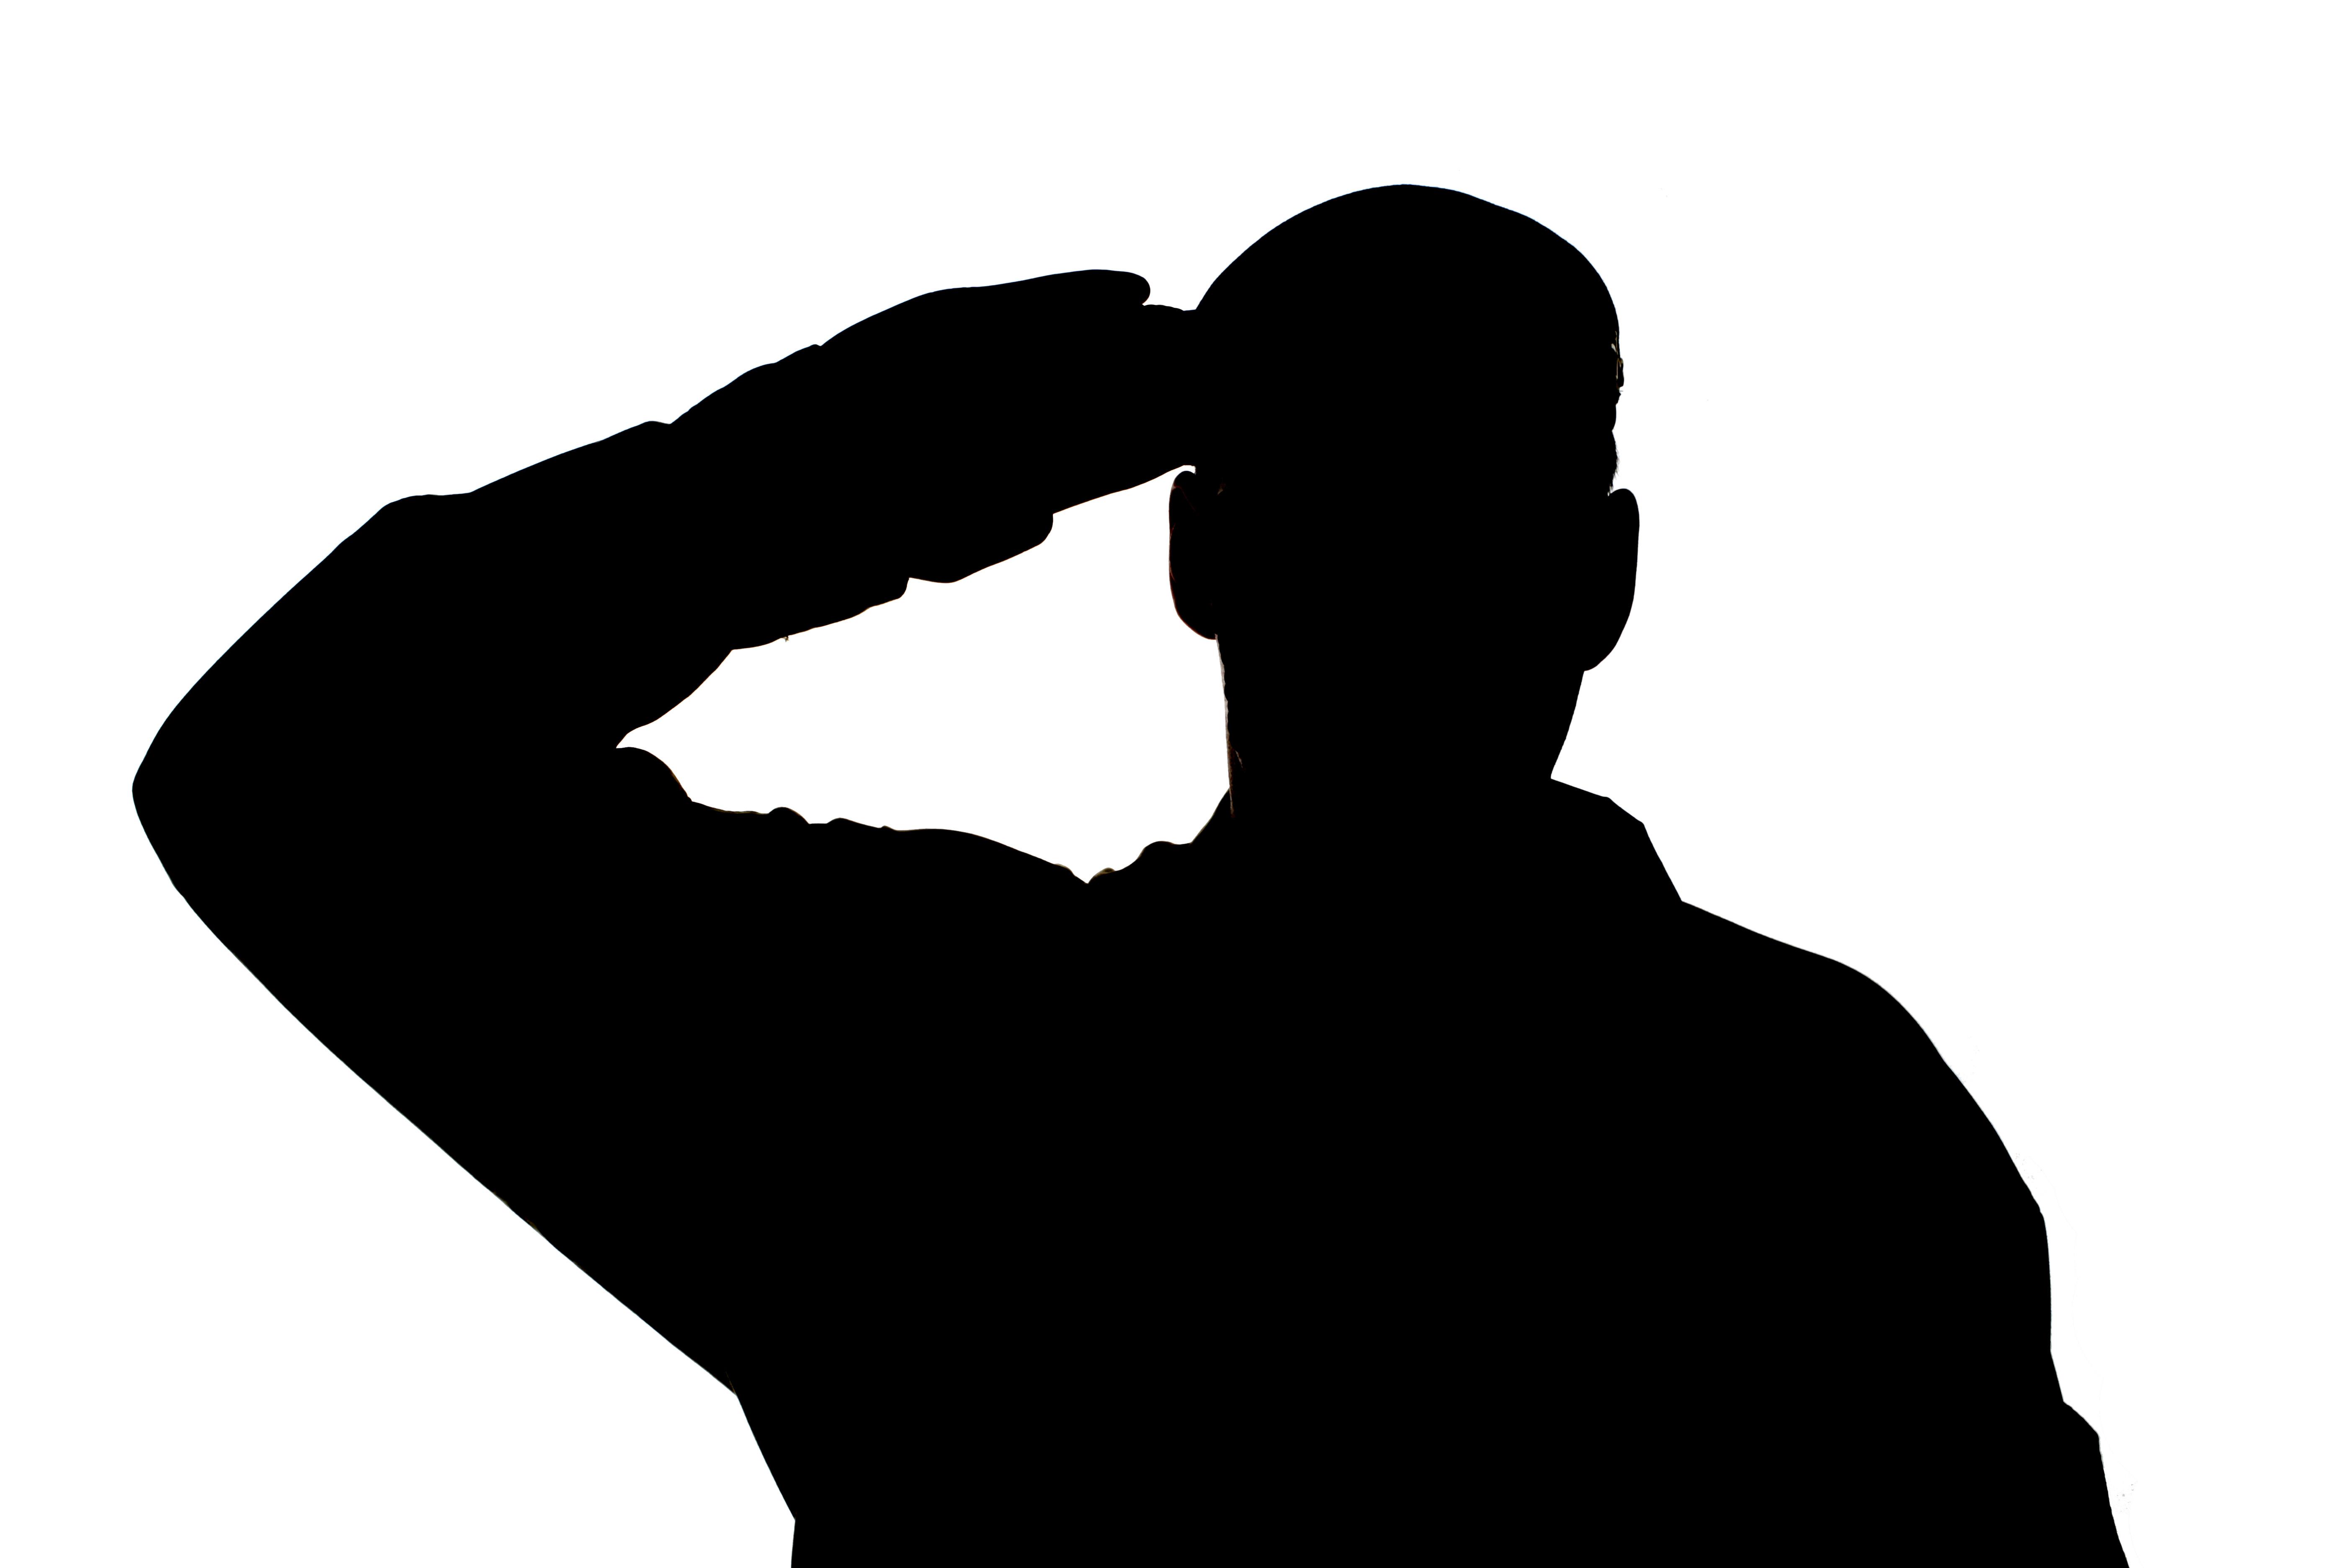 5616x3744 Filebritish Army Soldier Saluting Mod 45154892.jpg